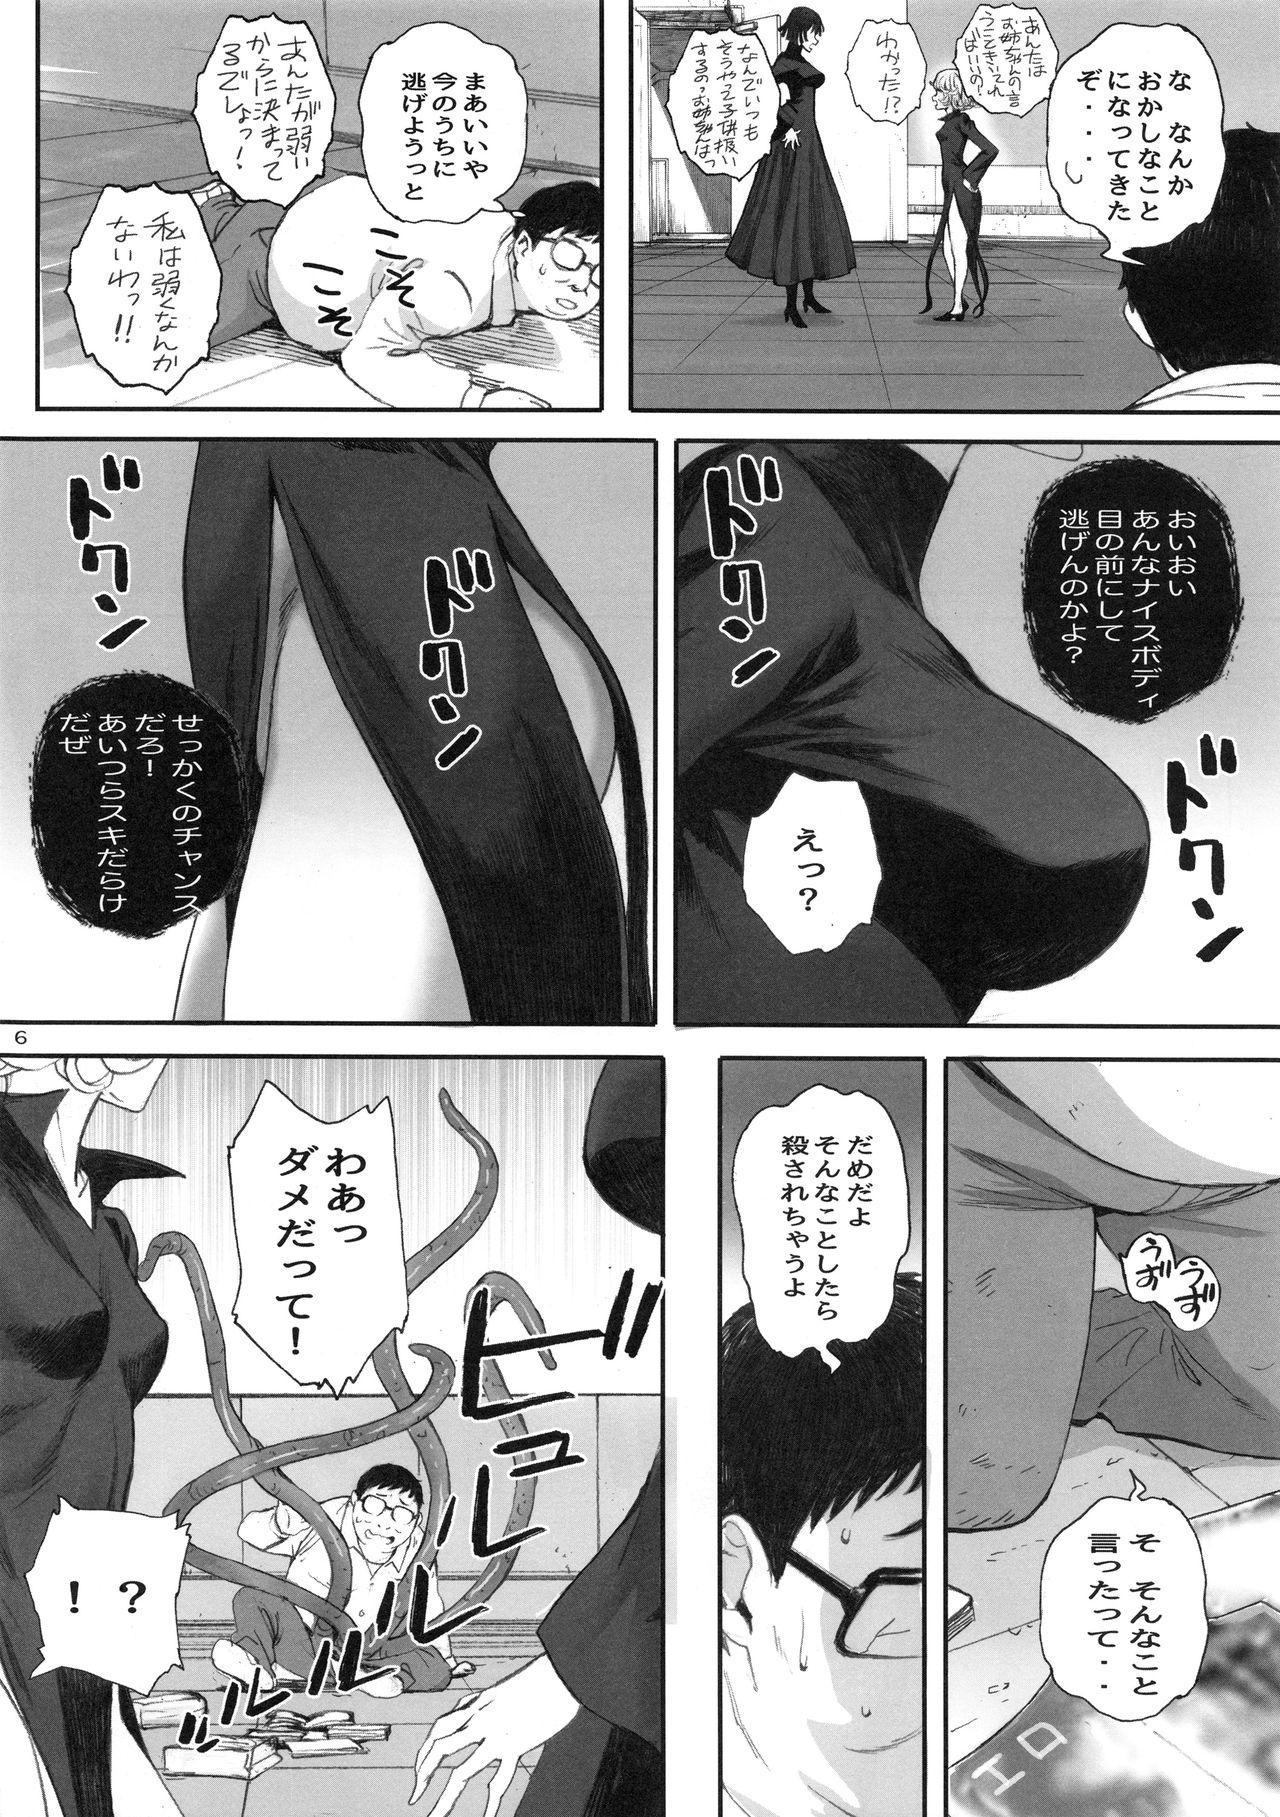 Ichigeki Haiboku 4